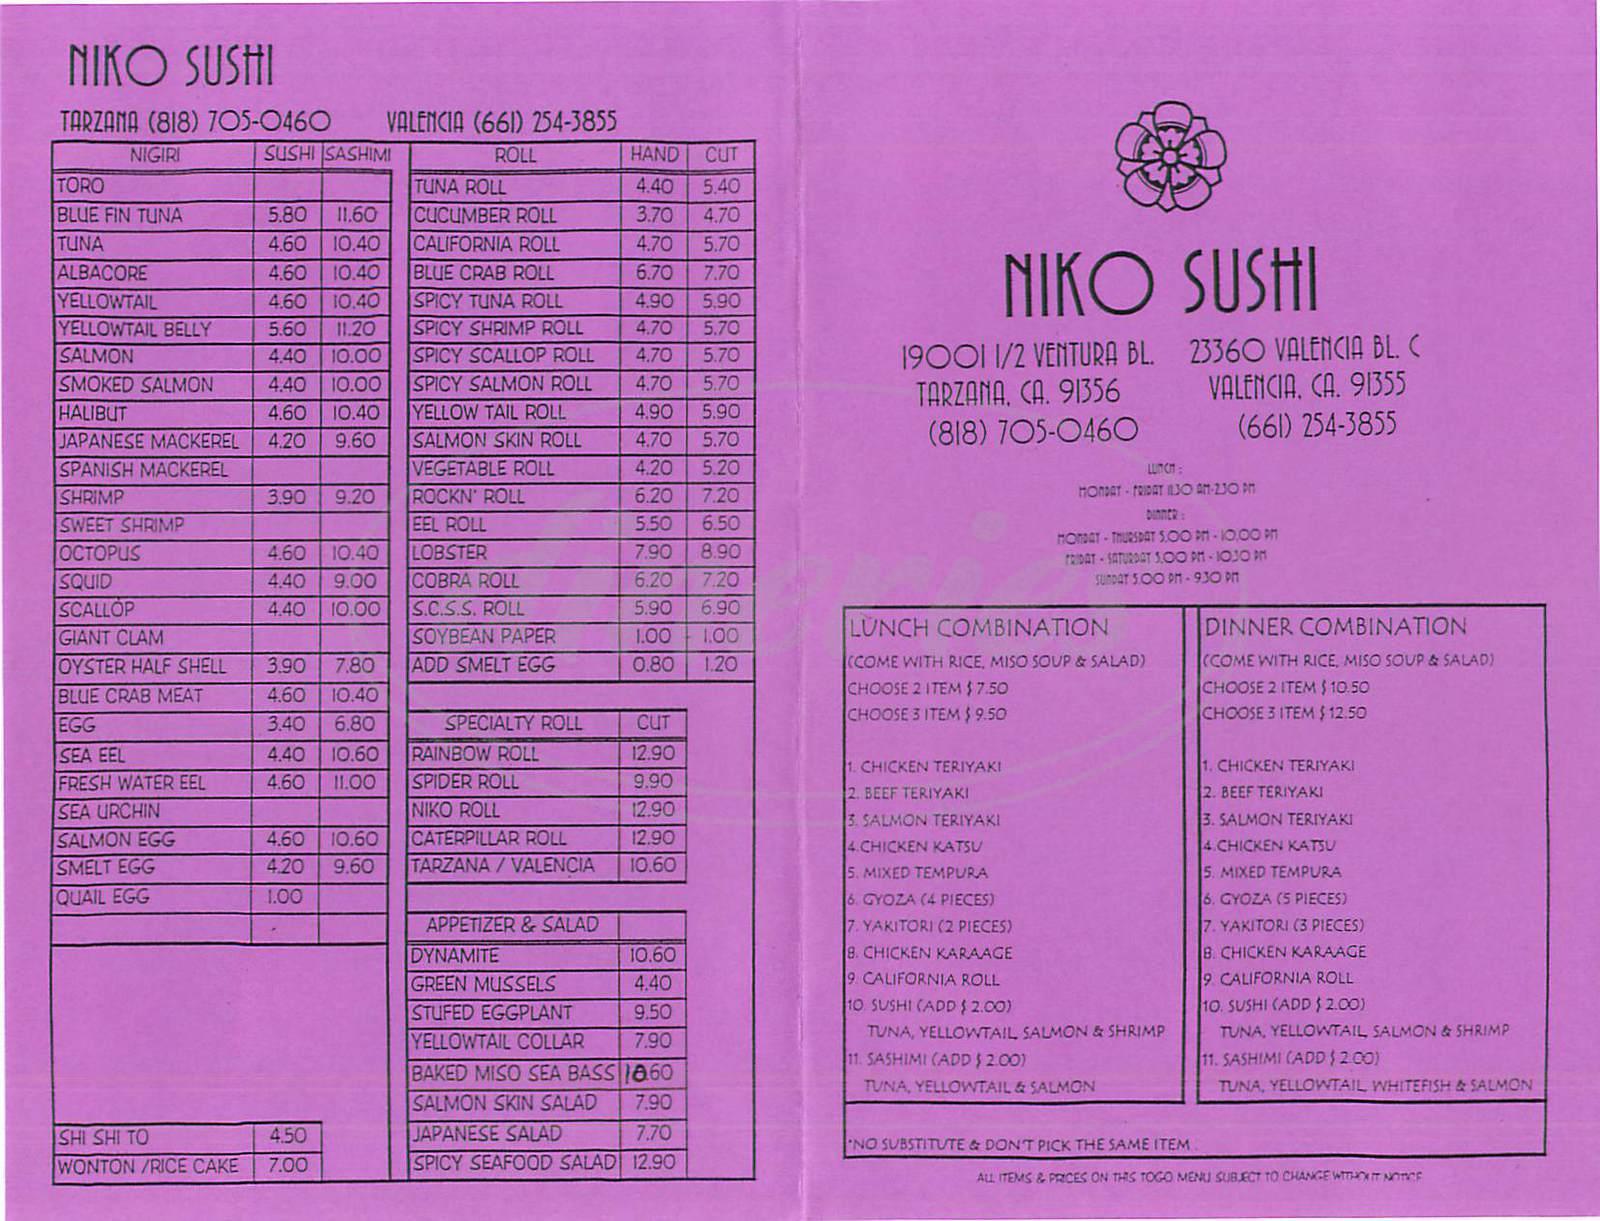 menu for Niko Sushi